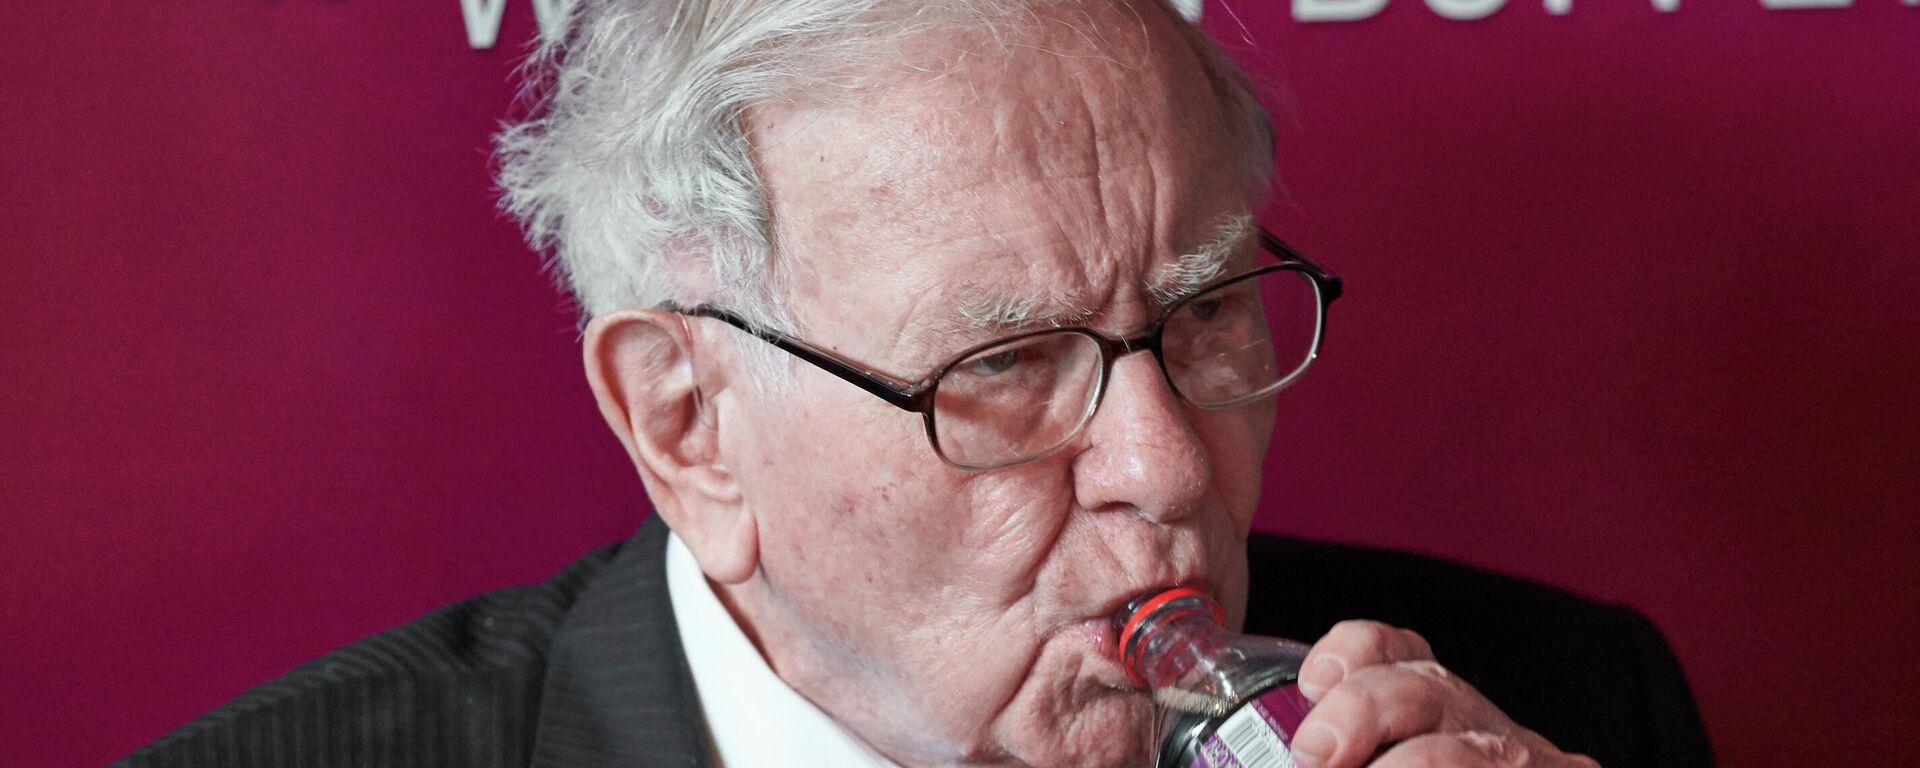 Investor Warren Buffett, enjoying a Coca-Cola in 2019 - Sputnik World, 1920, 2021.07.24